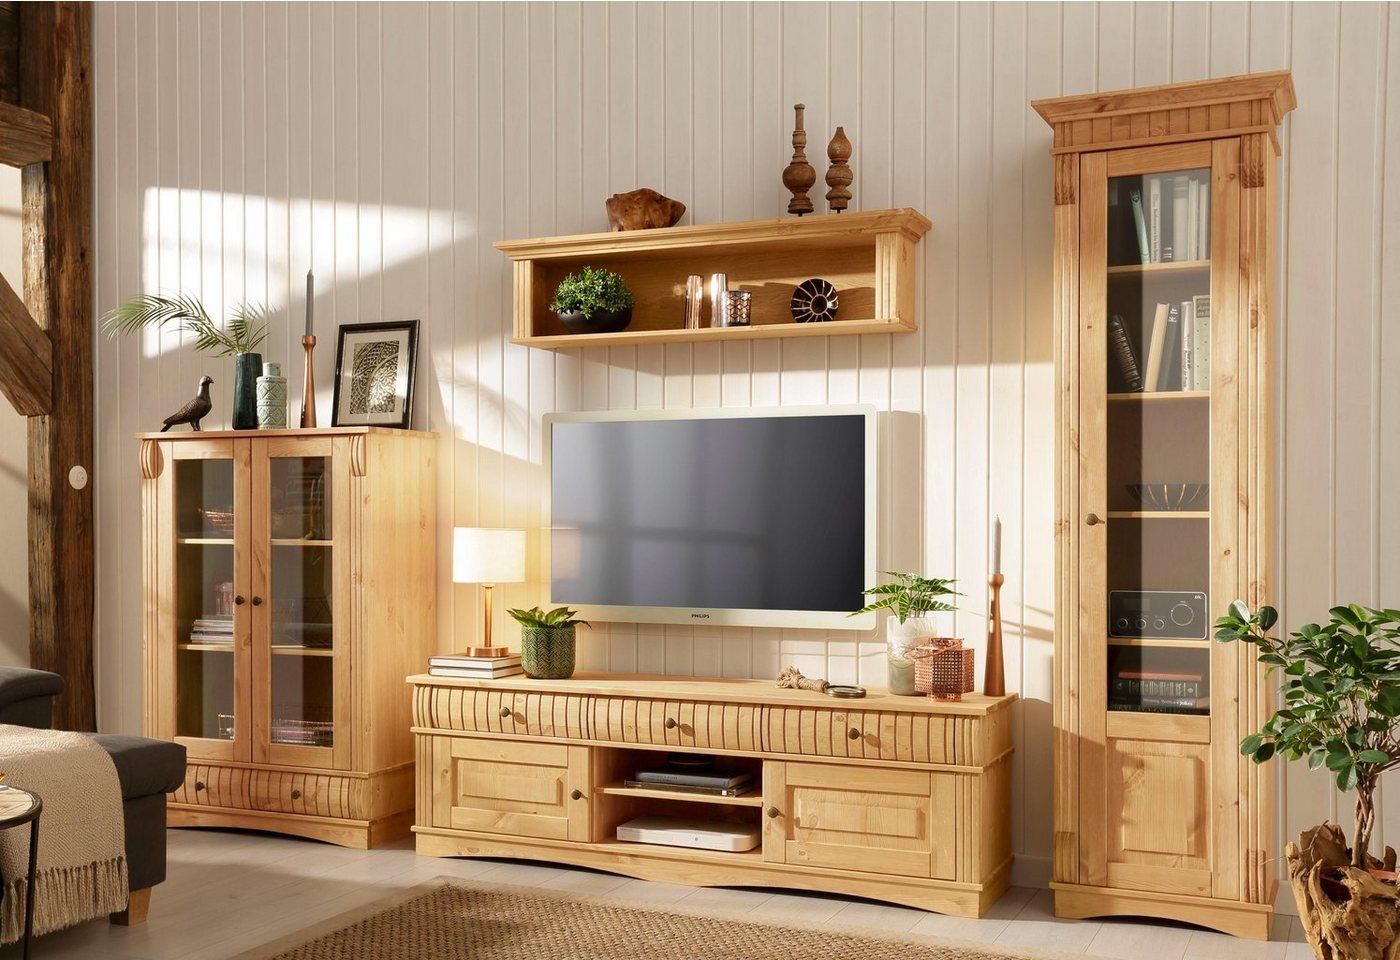 HOME AFFAIRE 3-delig wandmeubel Teresa: 1 vitrinekast klein, 1 vitrinekast groot, 1 TV-meubel